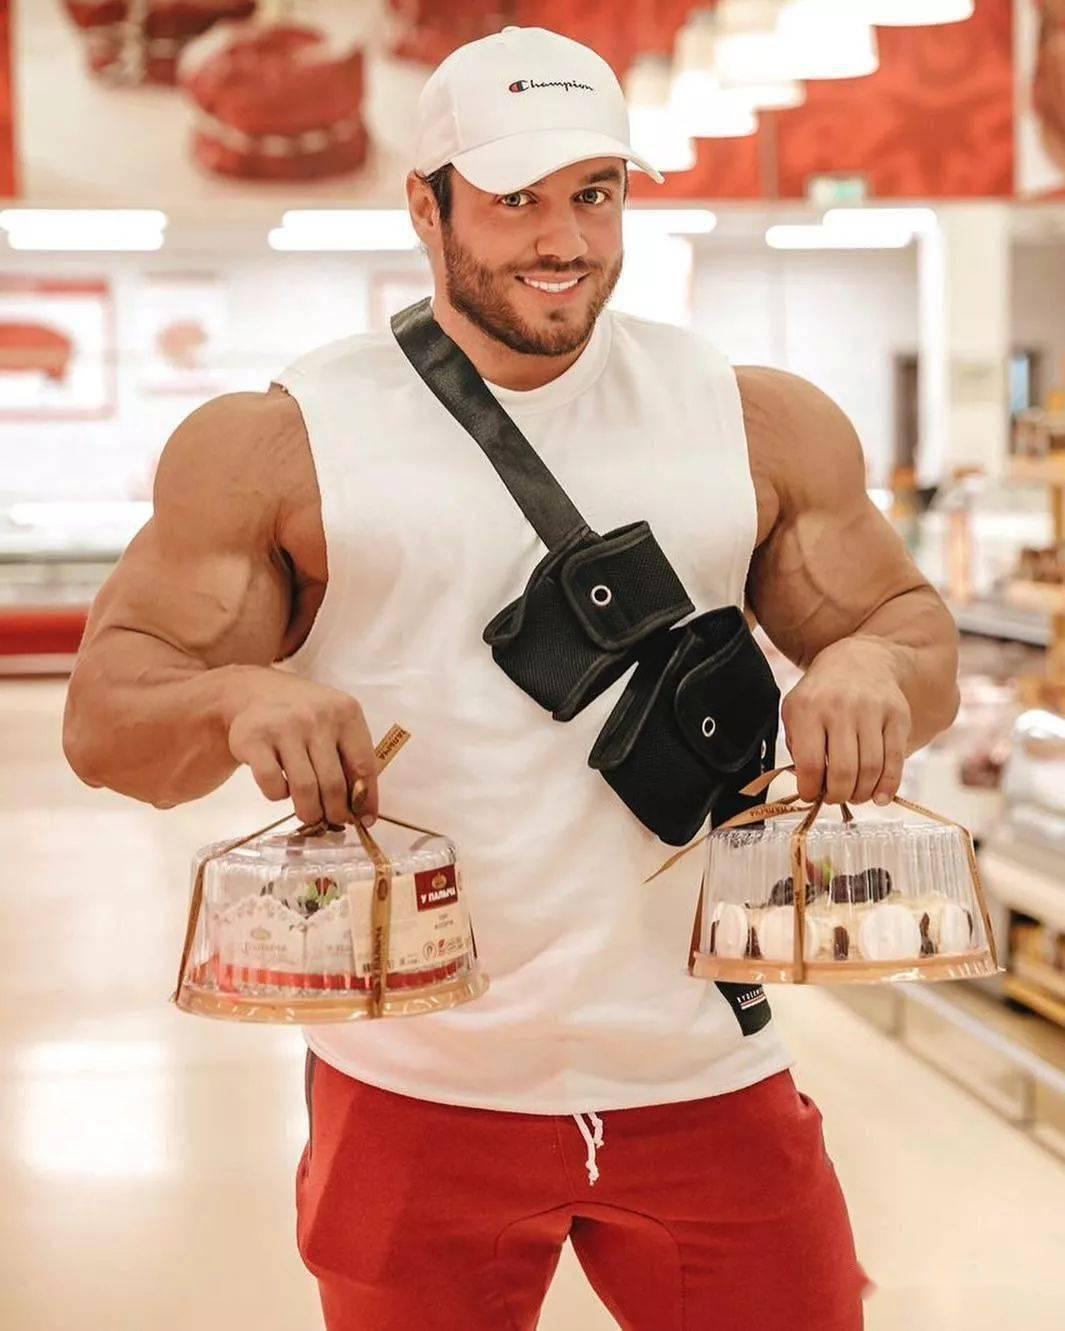 55cm臂围的肌肉硬汉,看了他的奶爸日常,我都想生娃了 初级健身 第34张